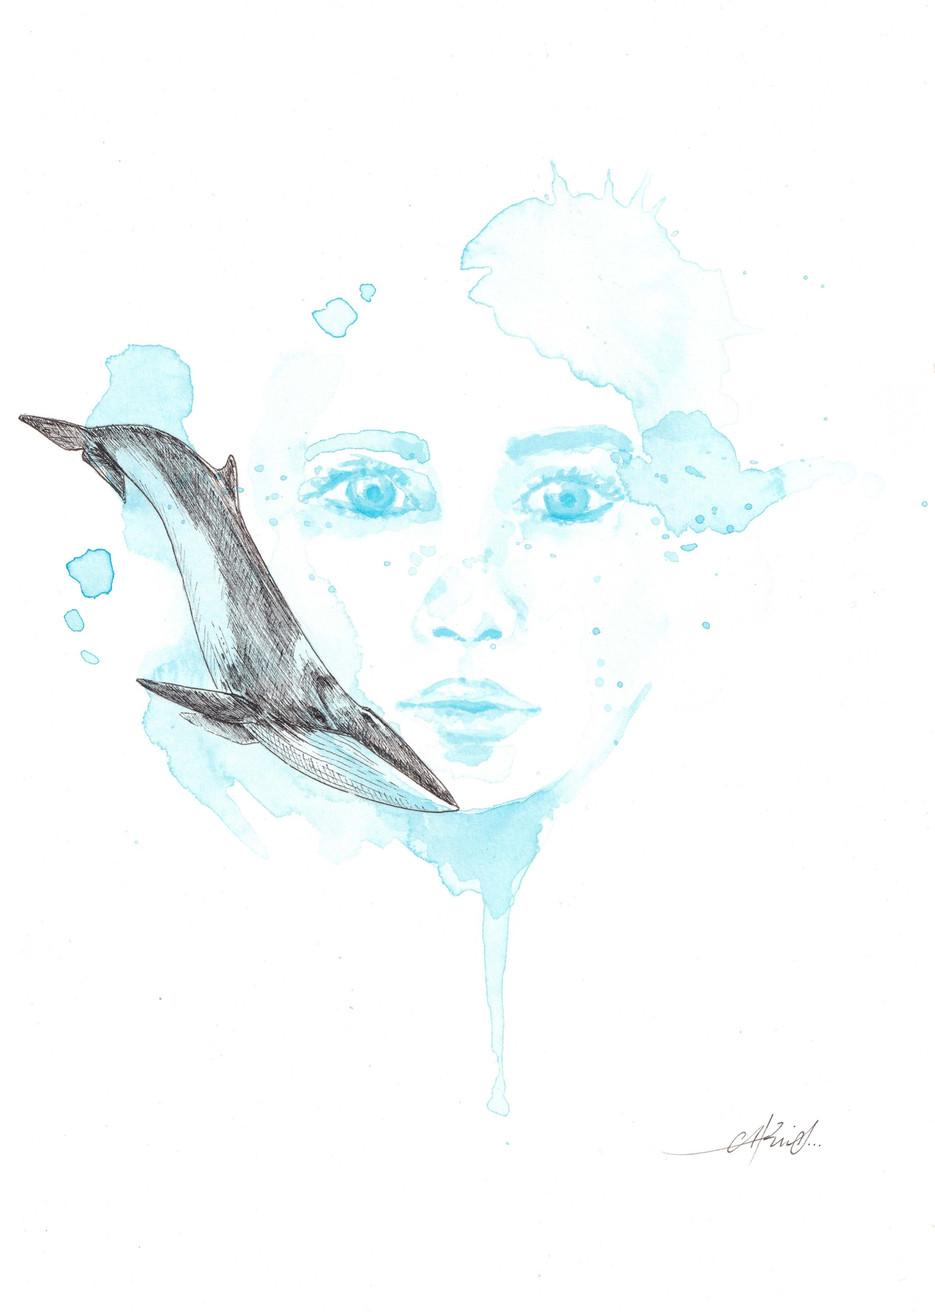 La niña y la ballena